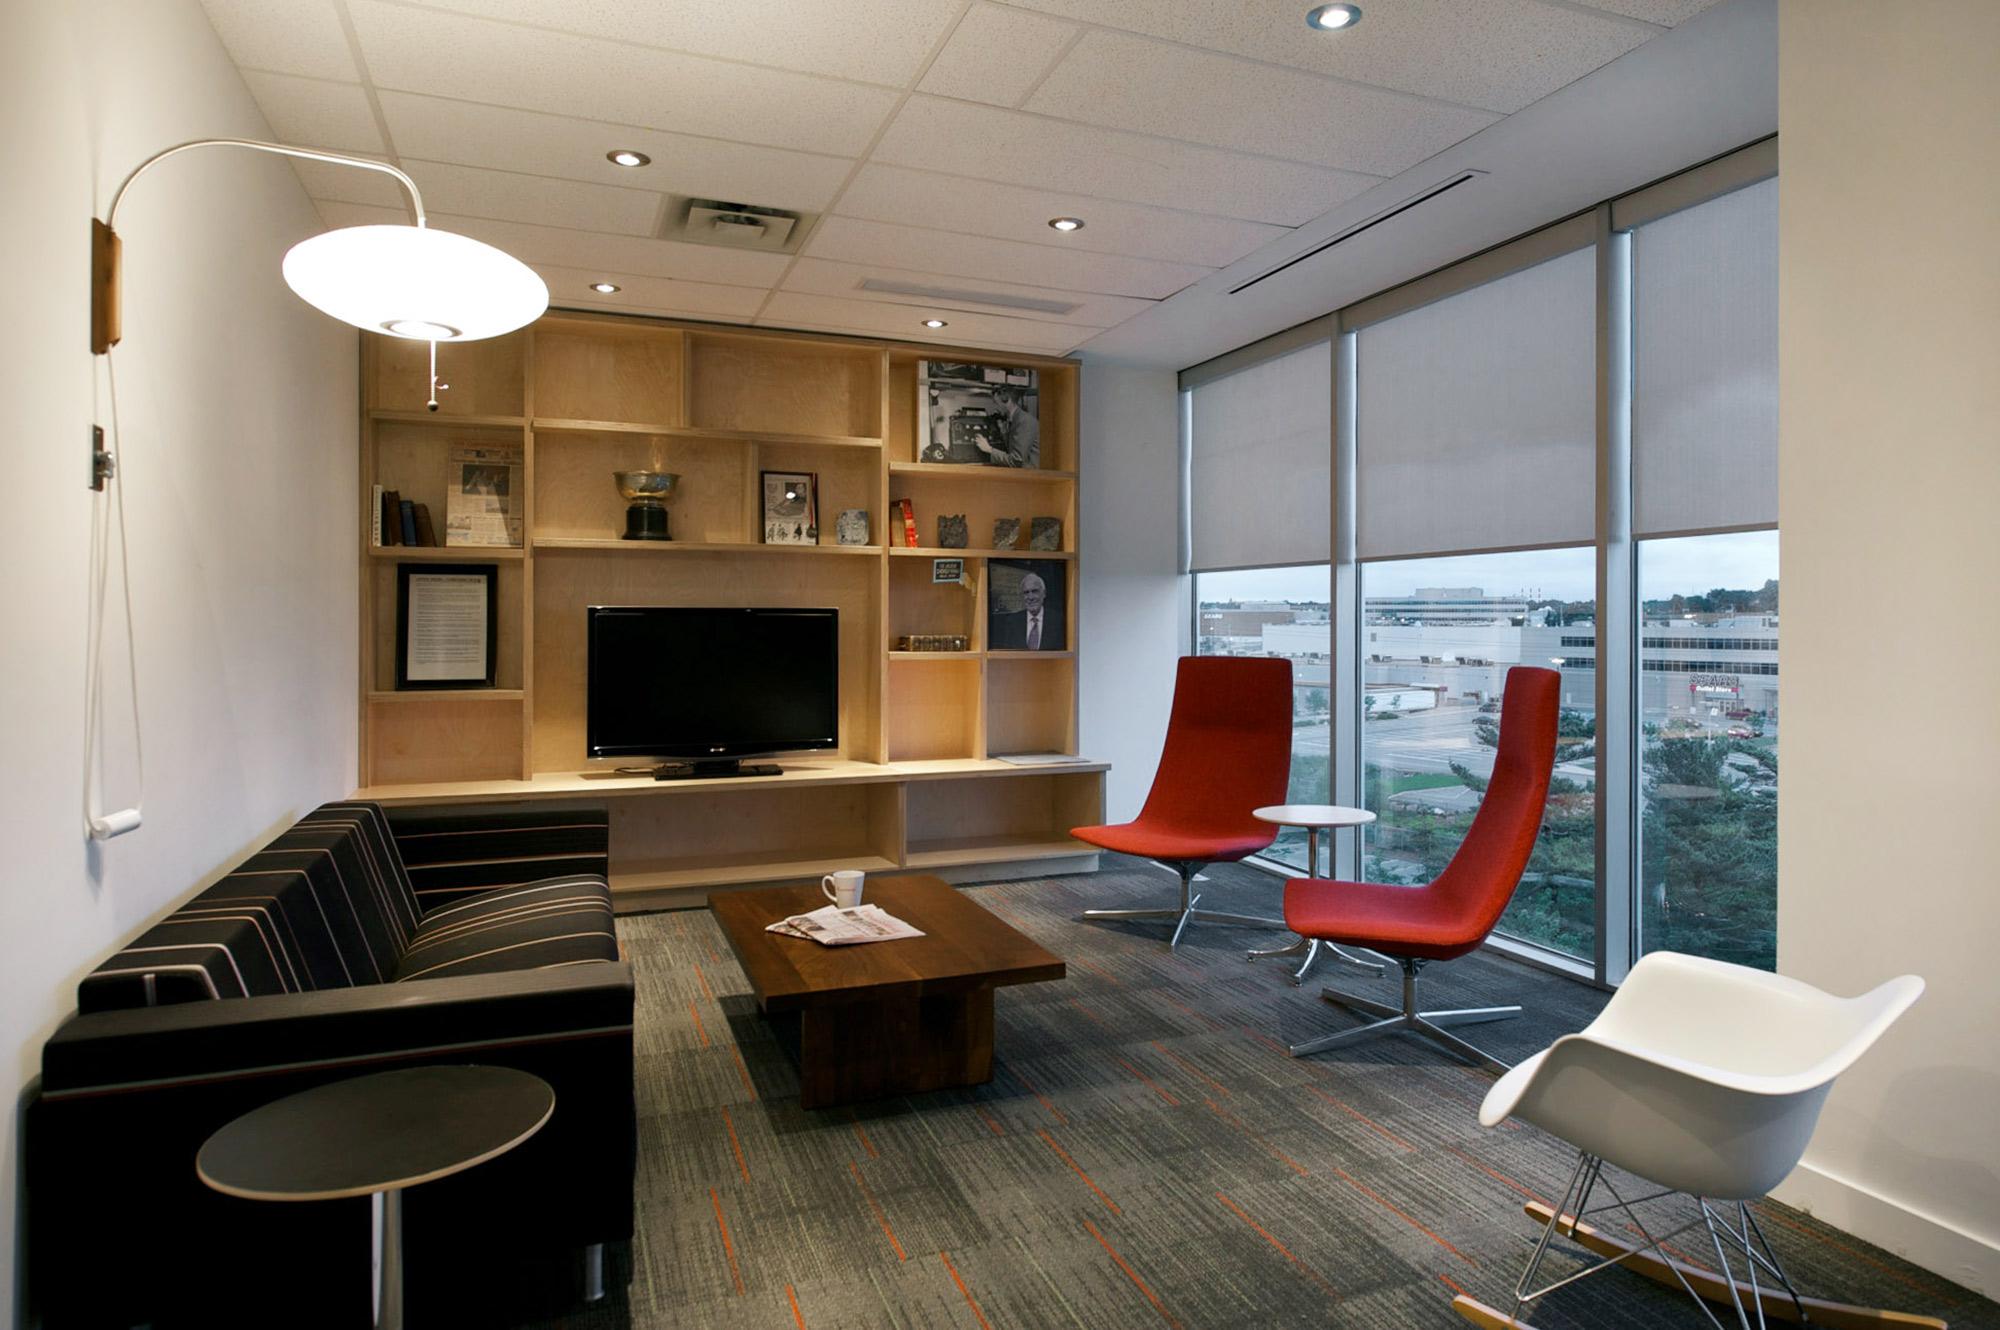 interior-design-media-office-common-area-view.jpg